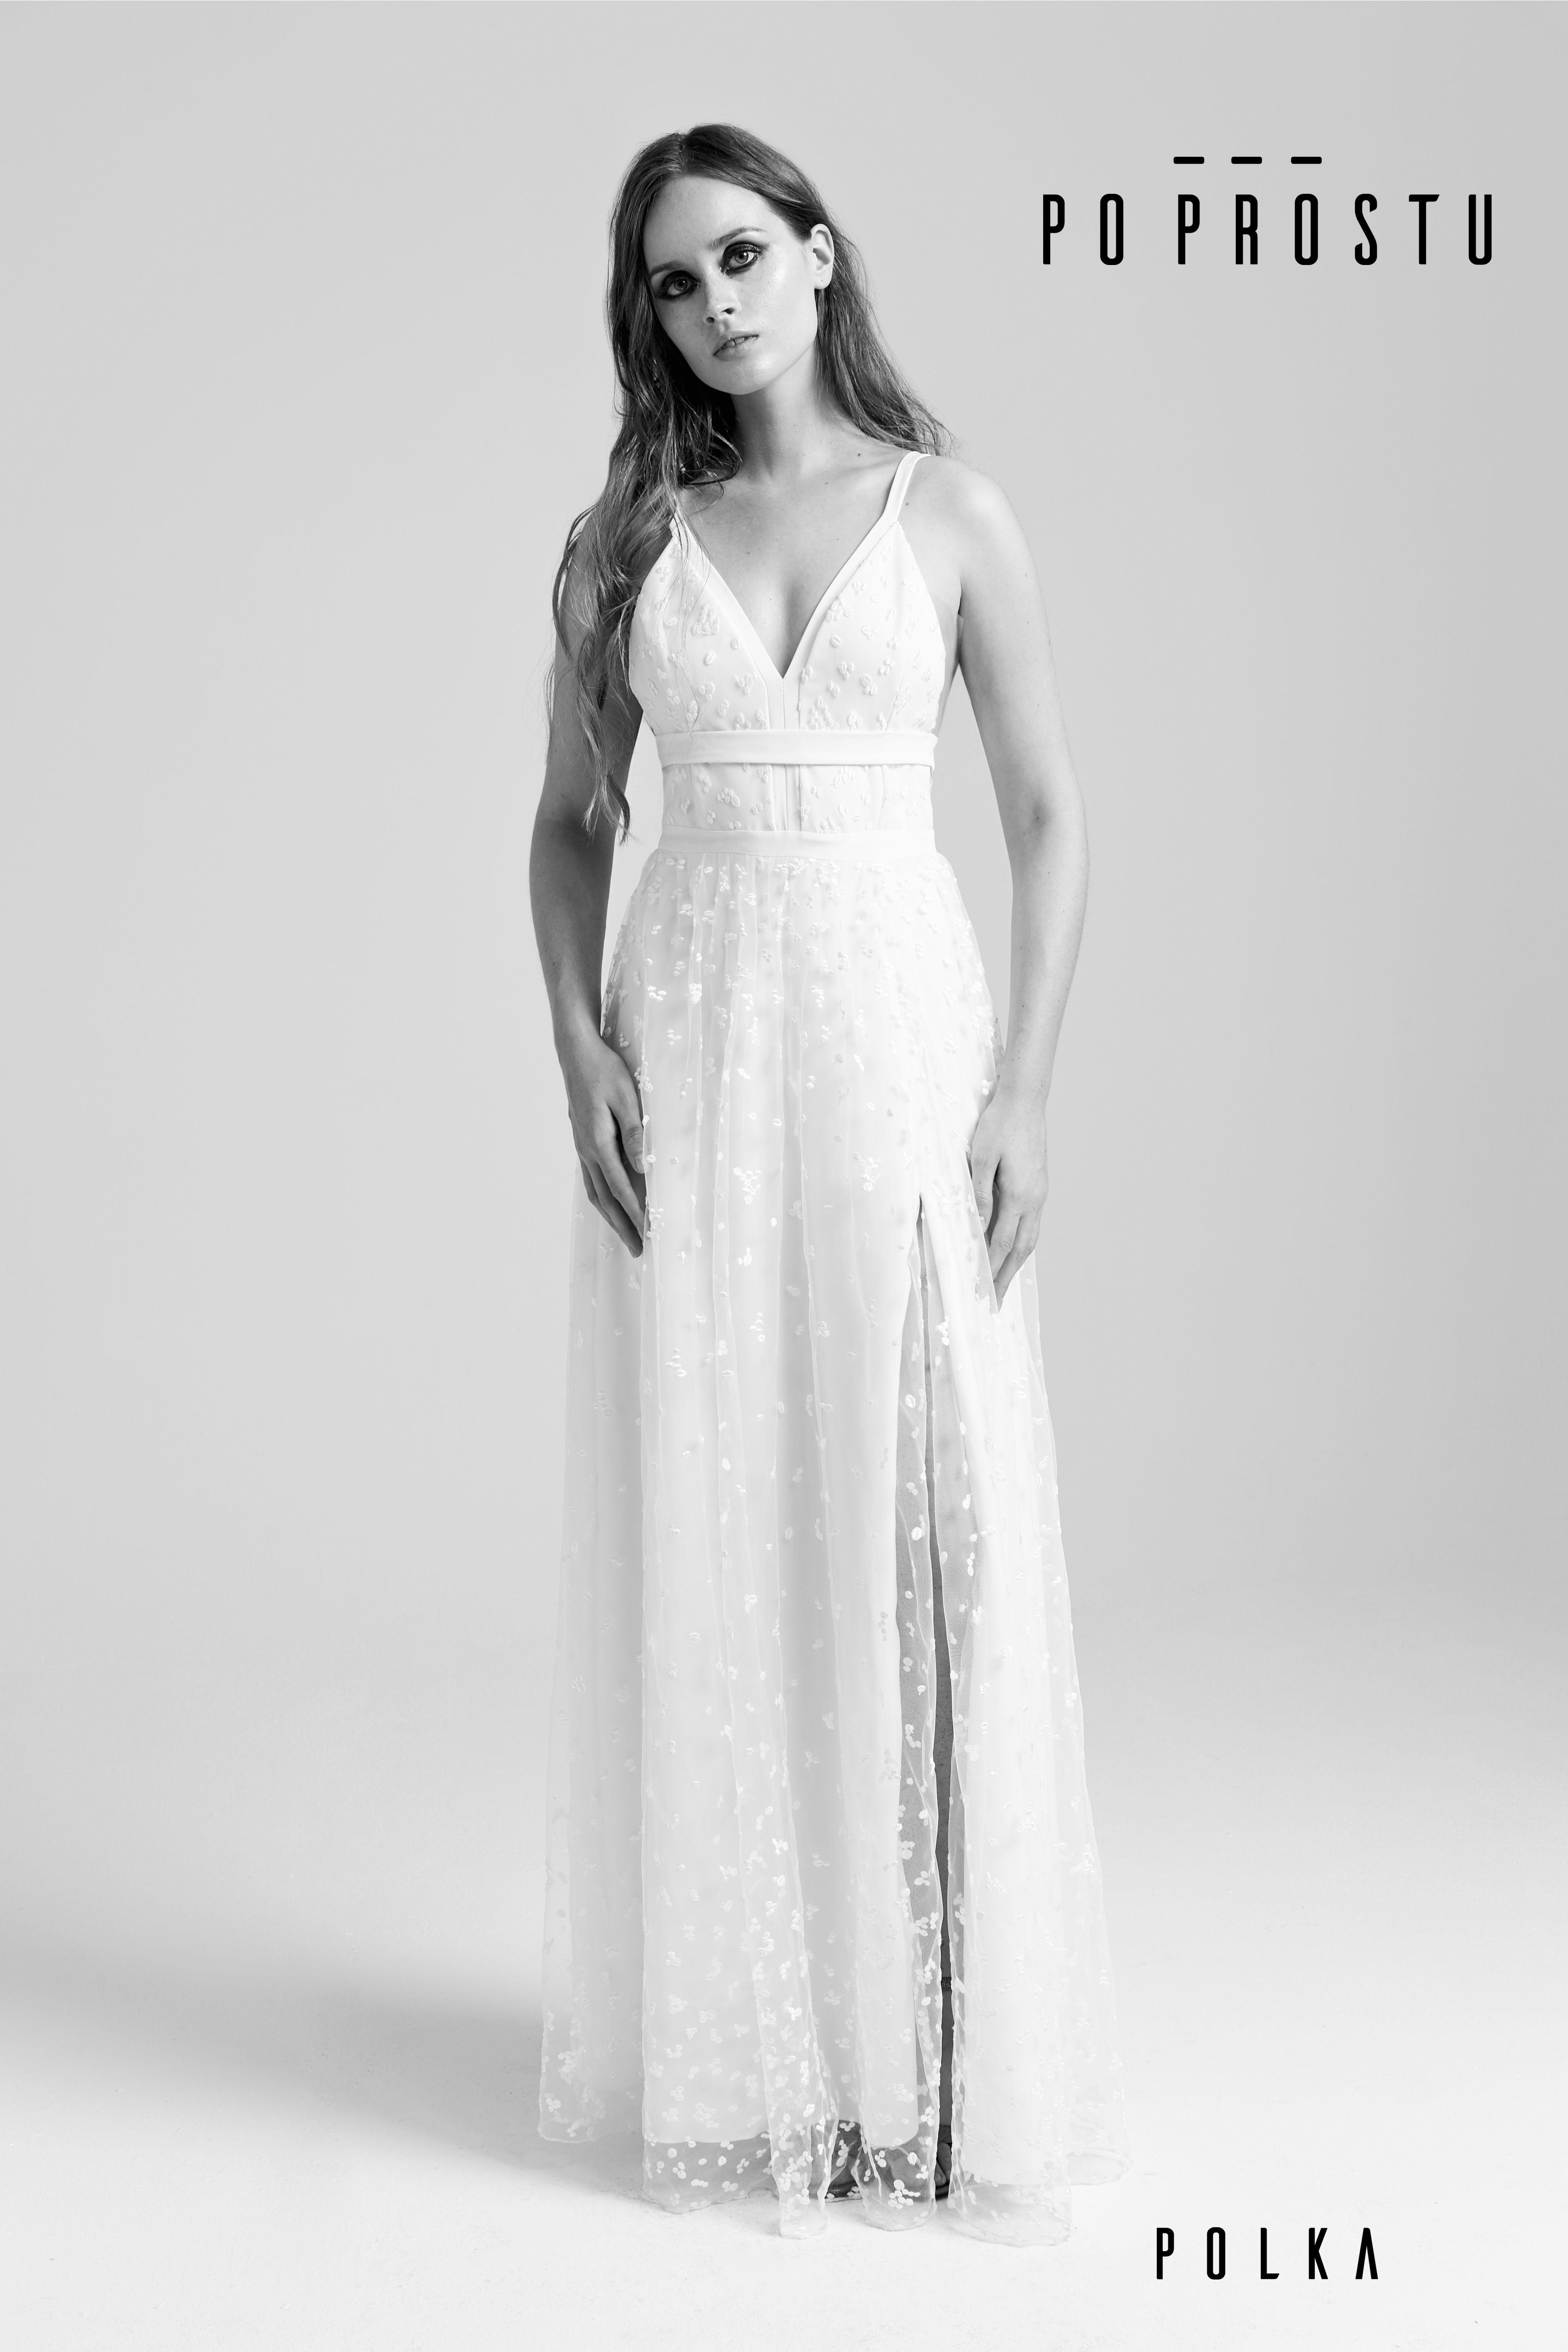 2c34708e2b ... Suknie Ślubne. Tagi. Proste Wesela · Simple wedding dresses. Polish  designer. Wedding dresses from designer. Wedding dress. Simple